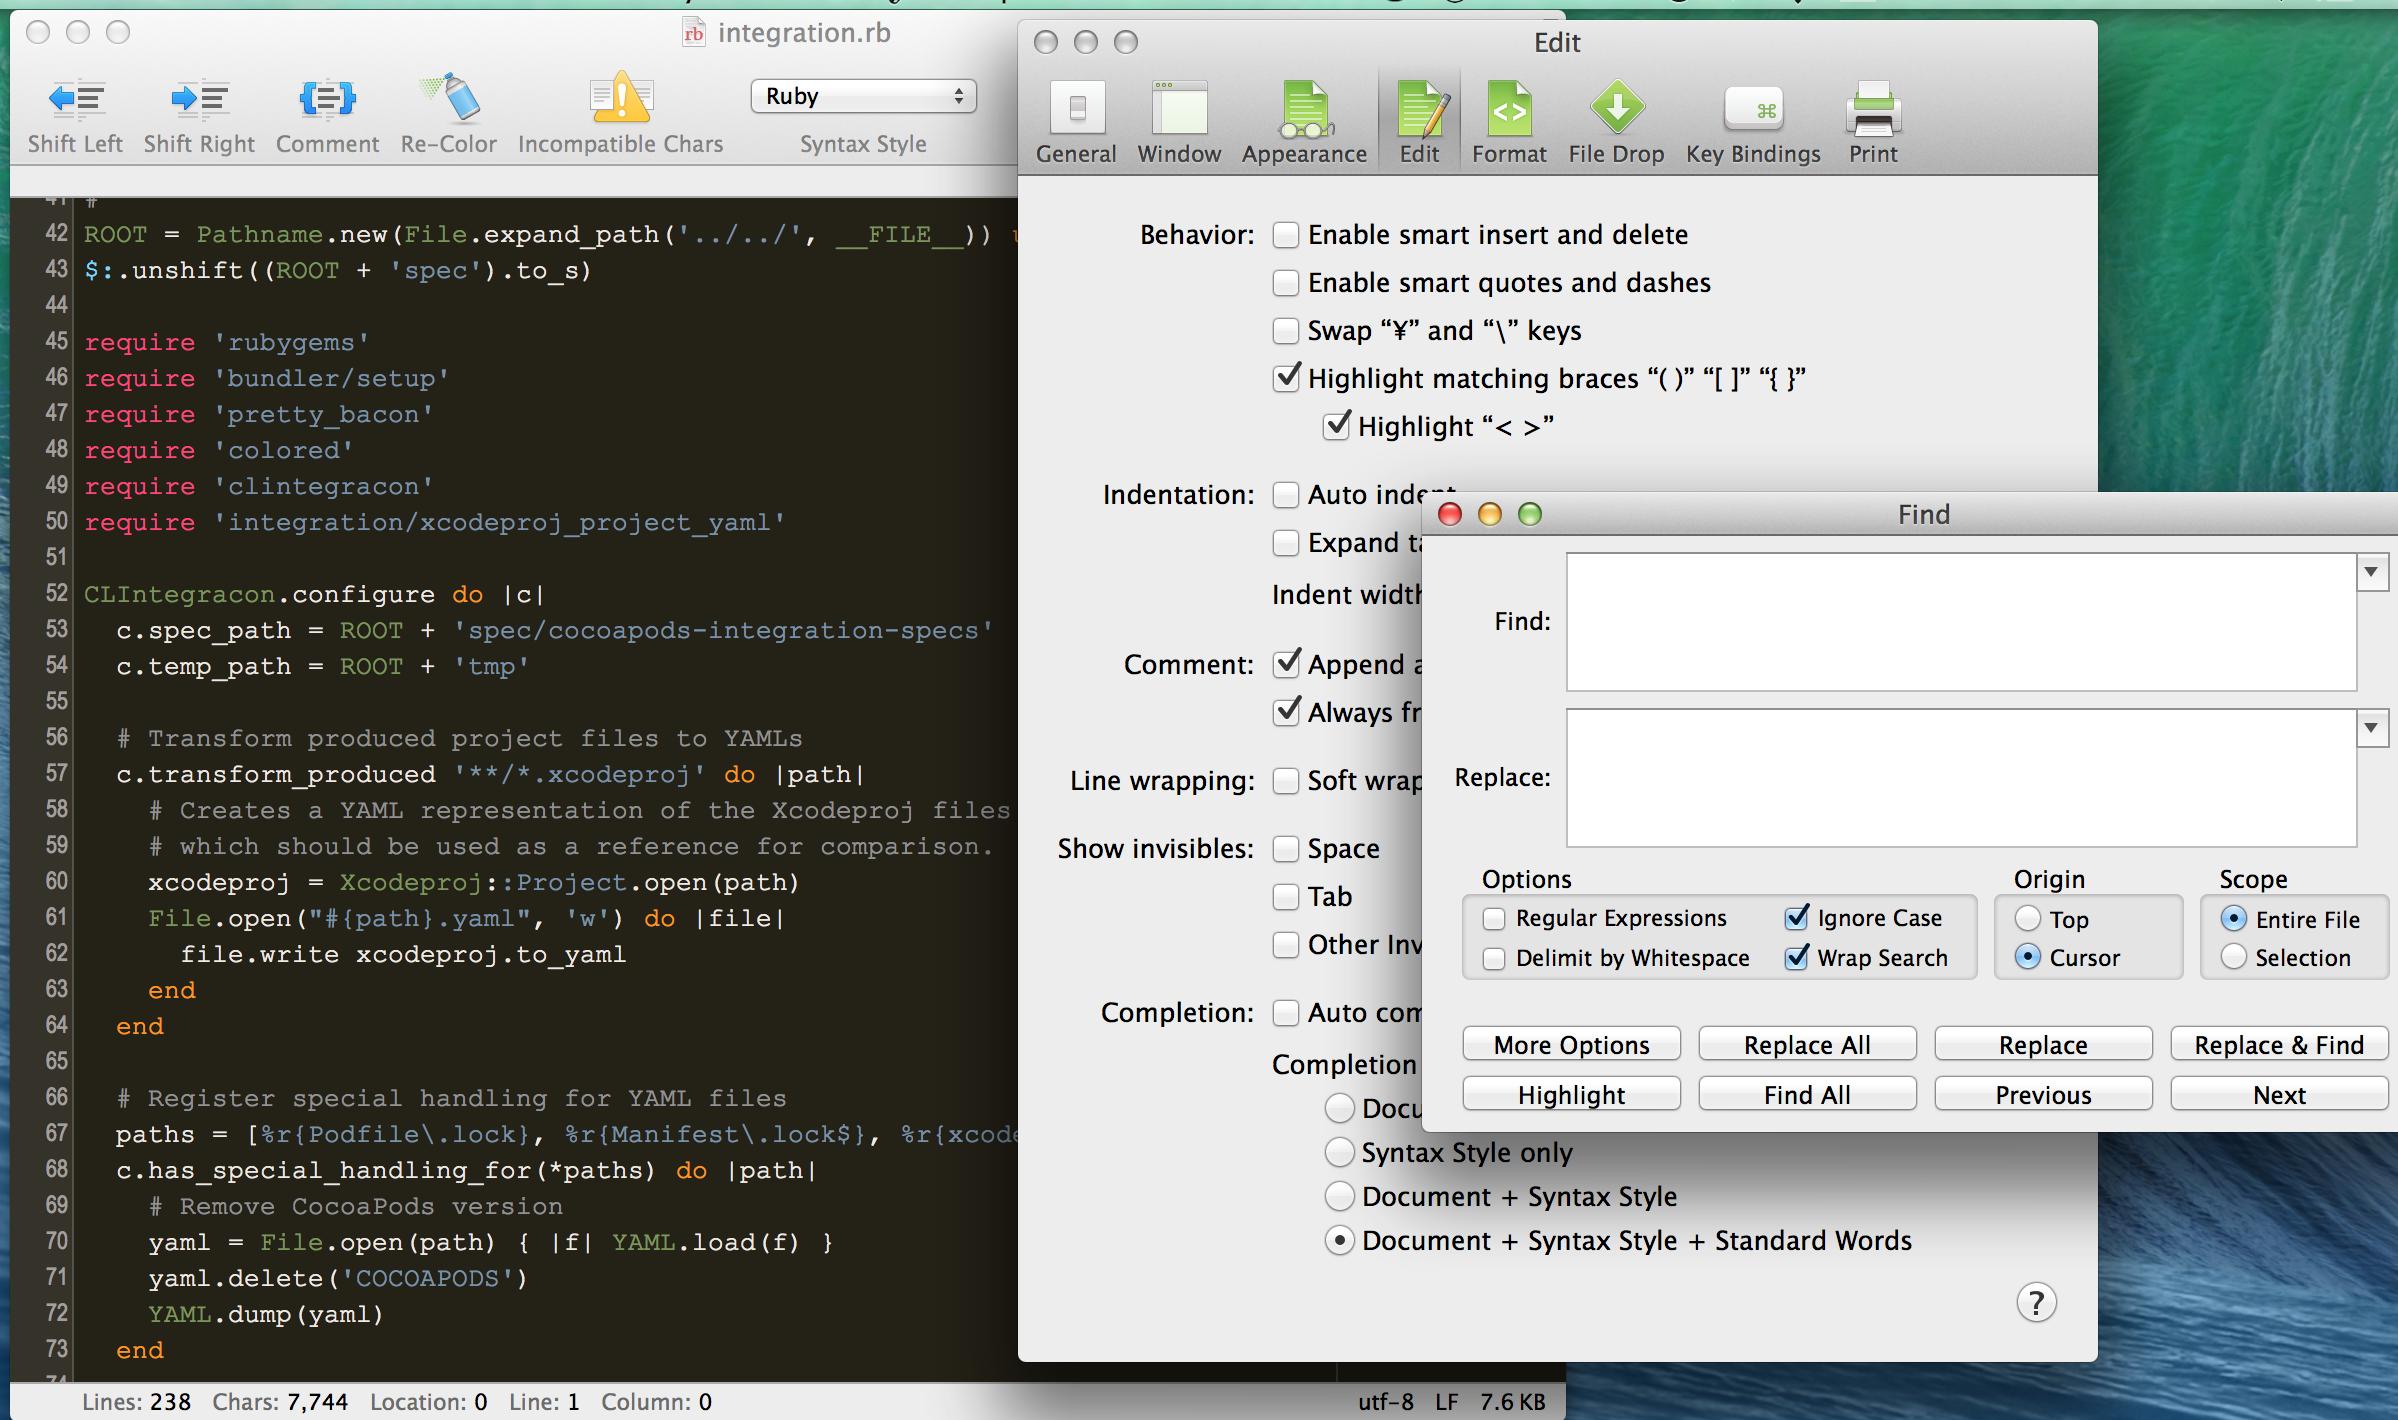 CotEditor1 CotEditor 2.1.2 发布  OS X 下的代码编辑器